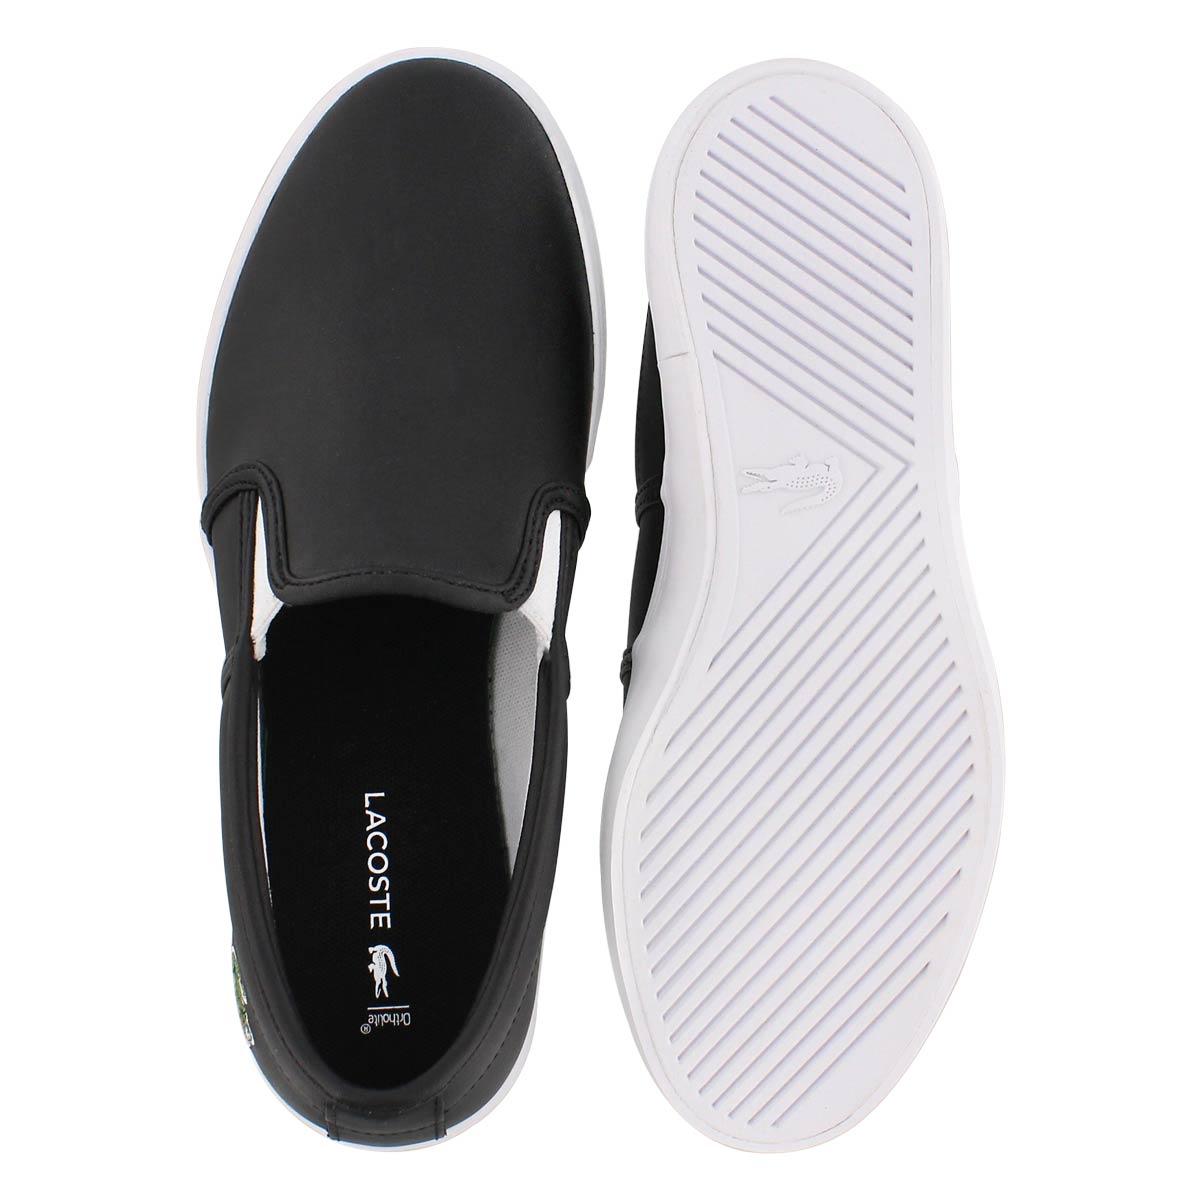 Lds Tatalya 118 1 2 P blk/wht loafer